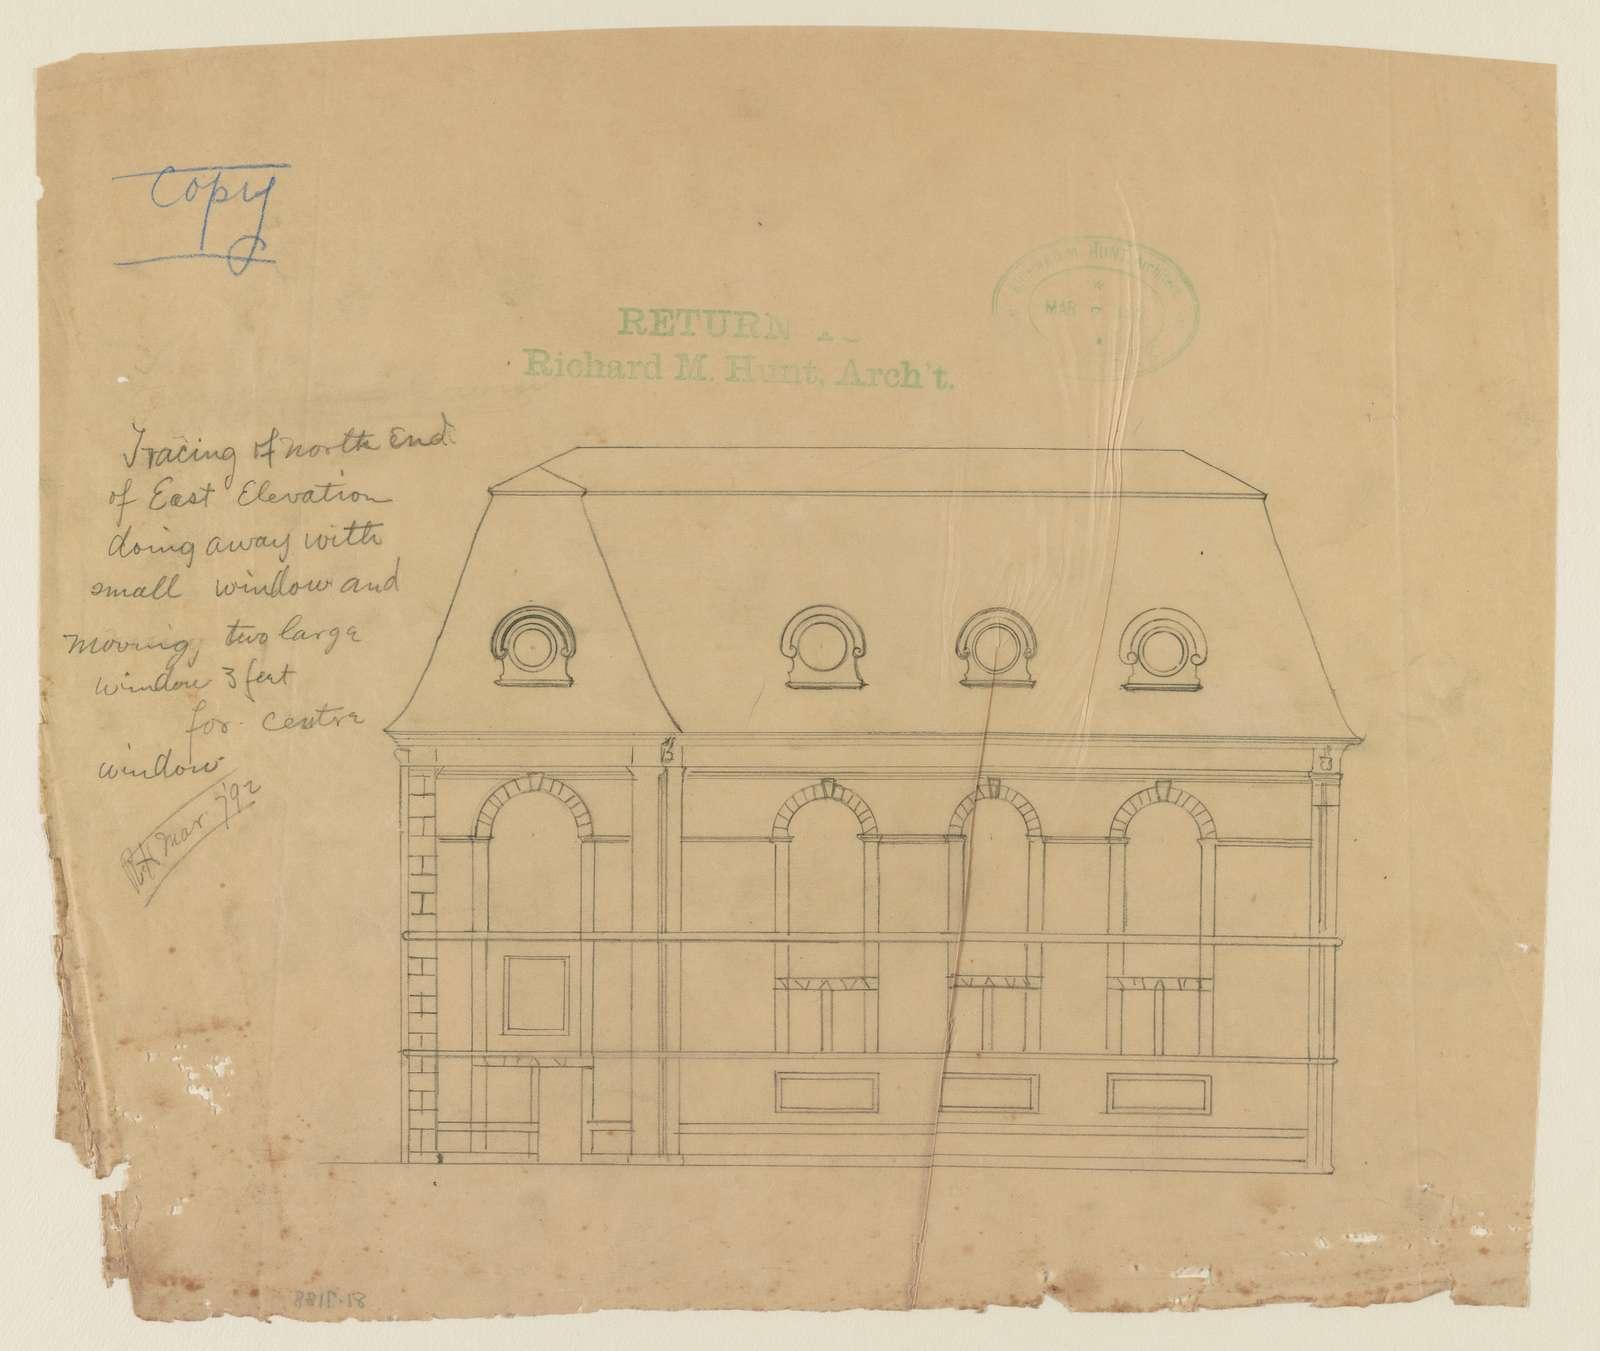 [Stable for Oliver Belmont Esq., Newport, R.I. North end of east elevation] / R.H.